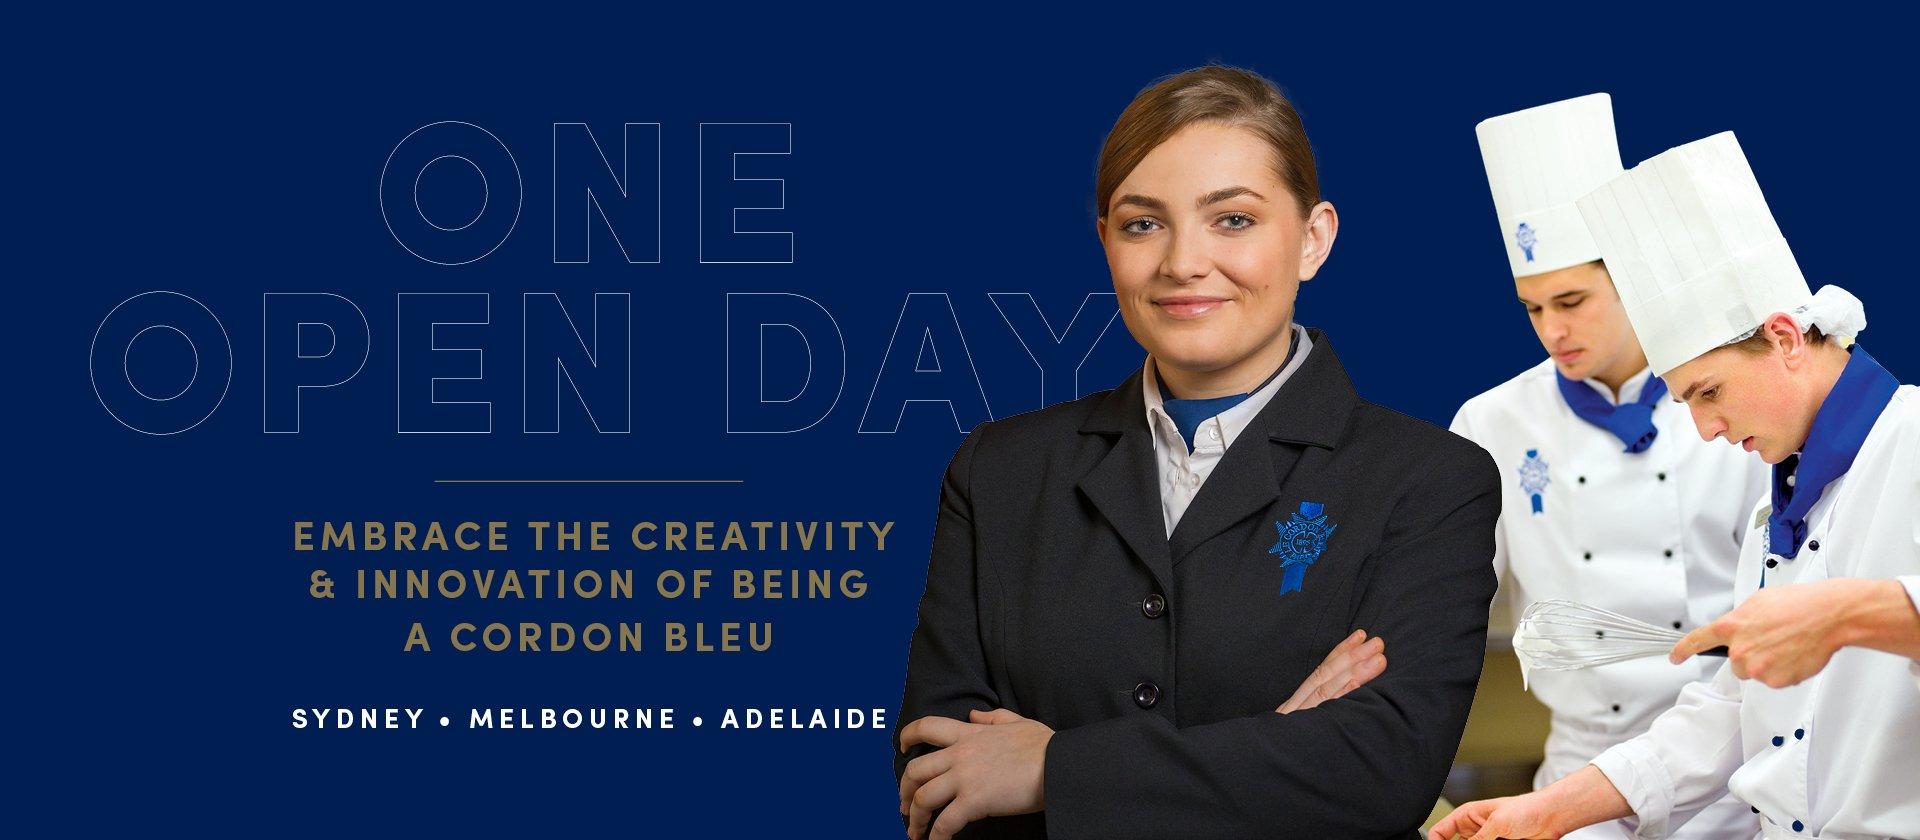 Le Cordon Bleu Open Days 2016 Adelaide Sydney Melbourne